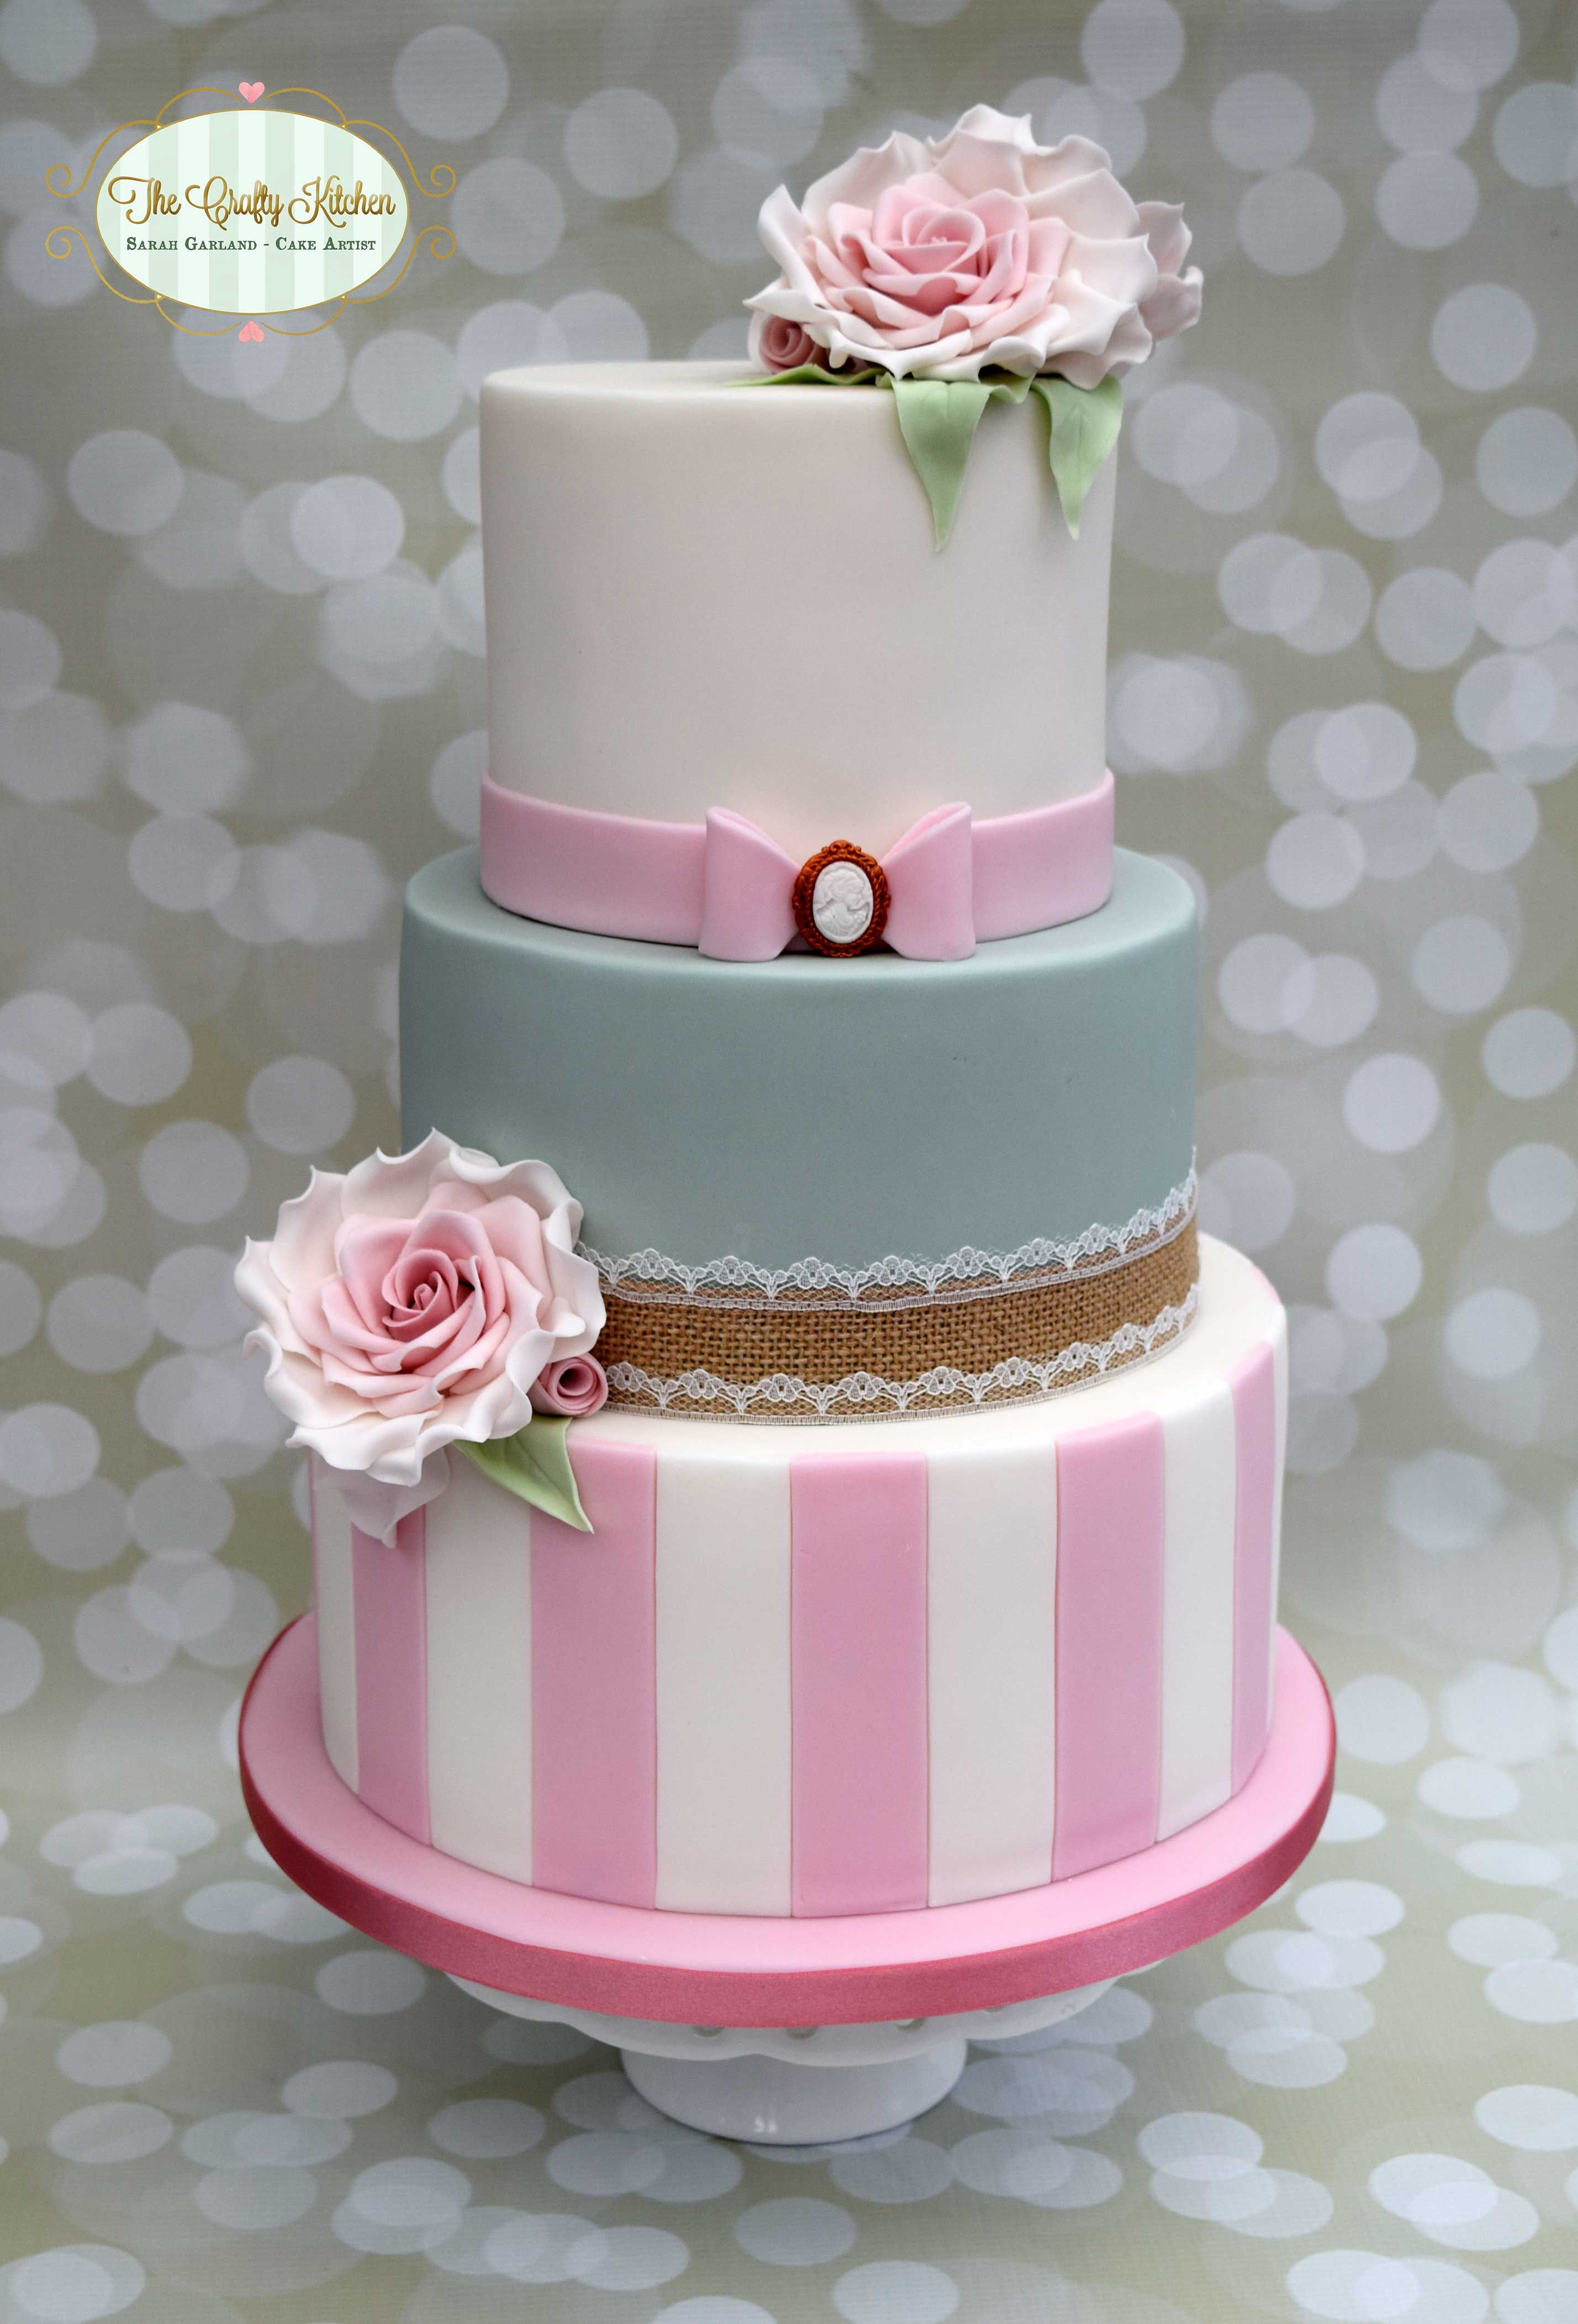 Vintage Wedding Cake Www Thecraftykitchen Co Uk Happy Birthday Cakes Wedding Cakes Vintage Cake Decorating